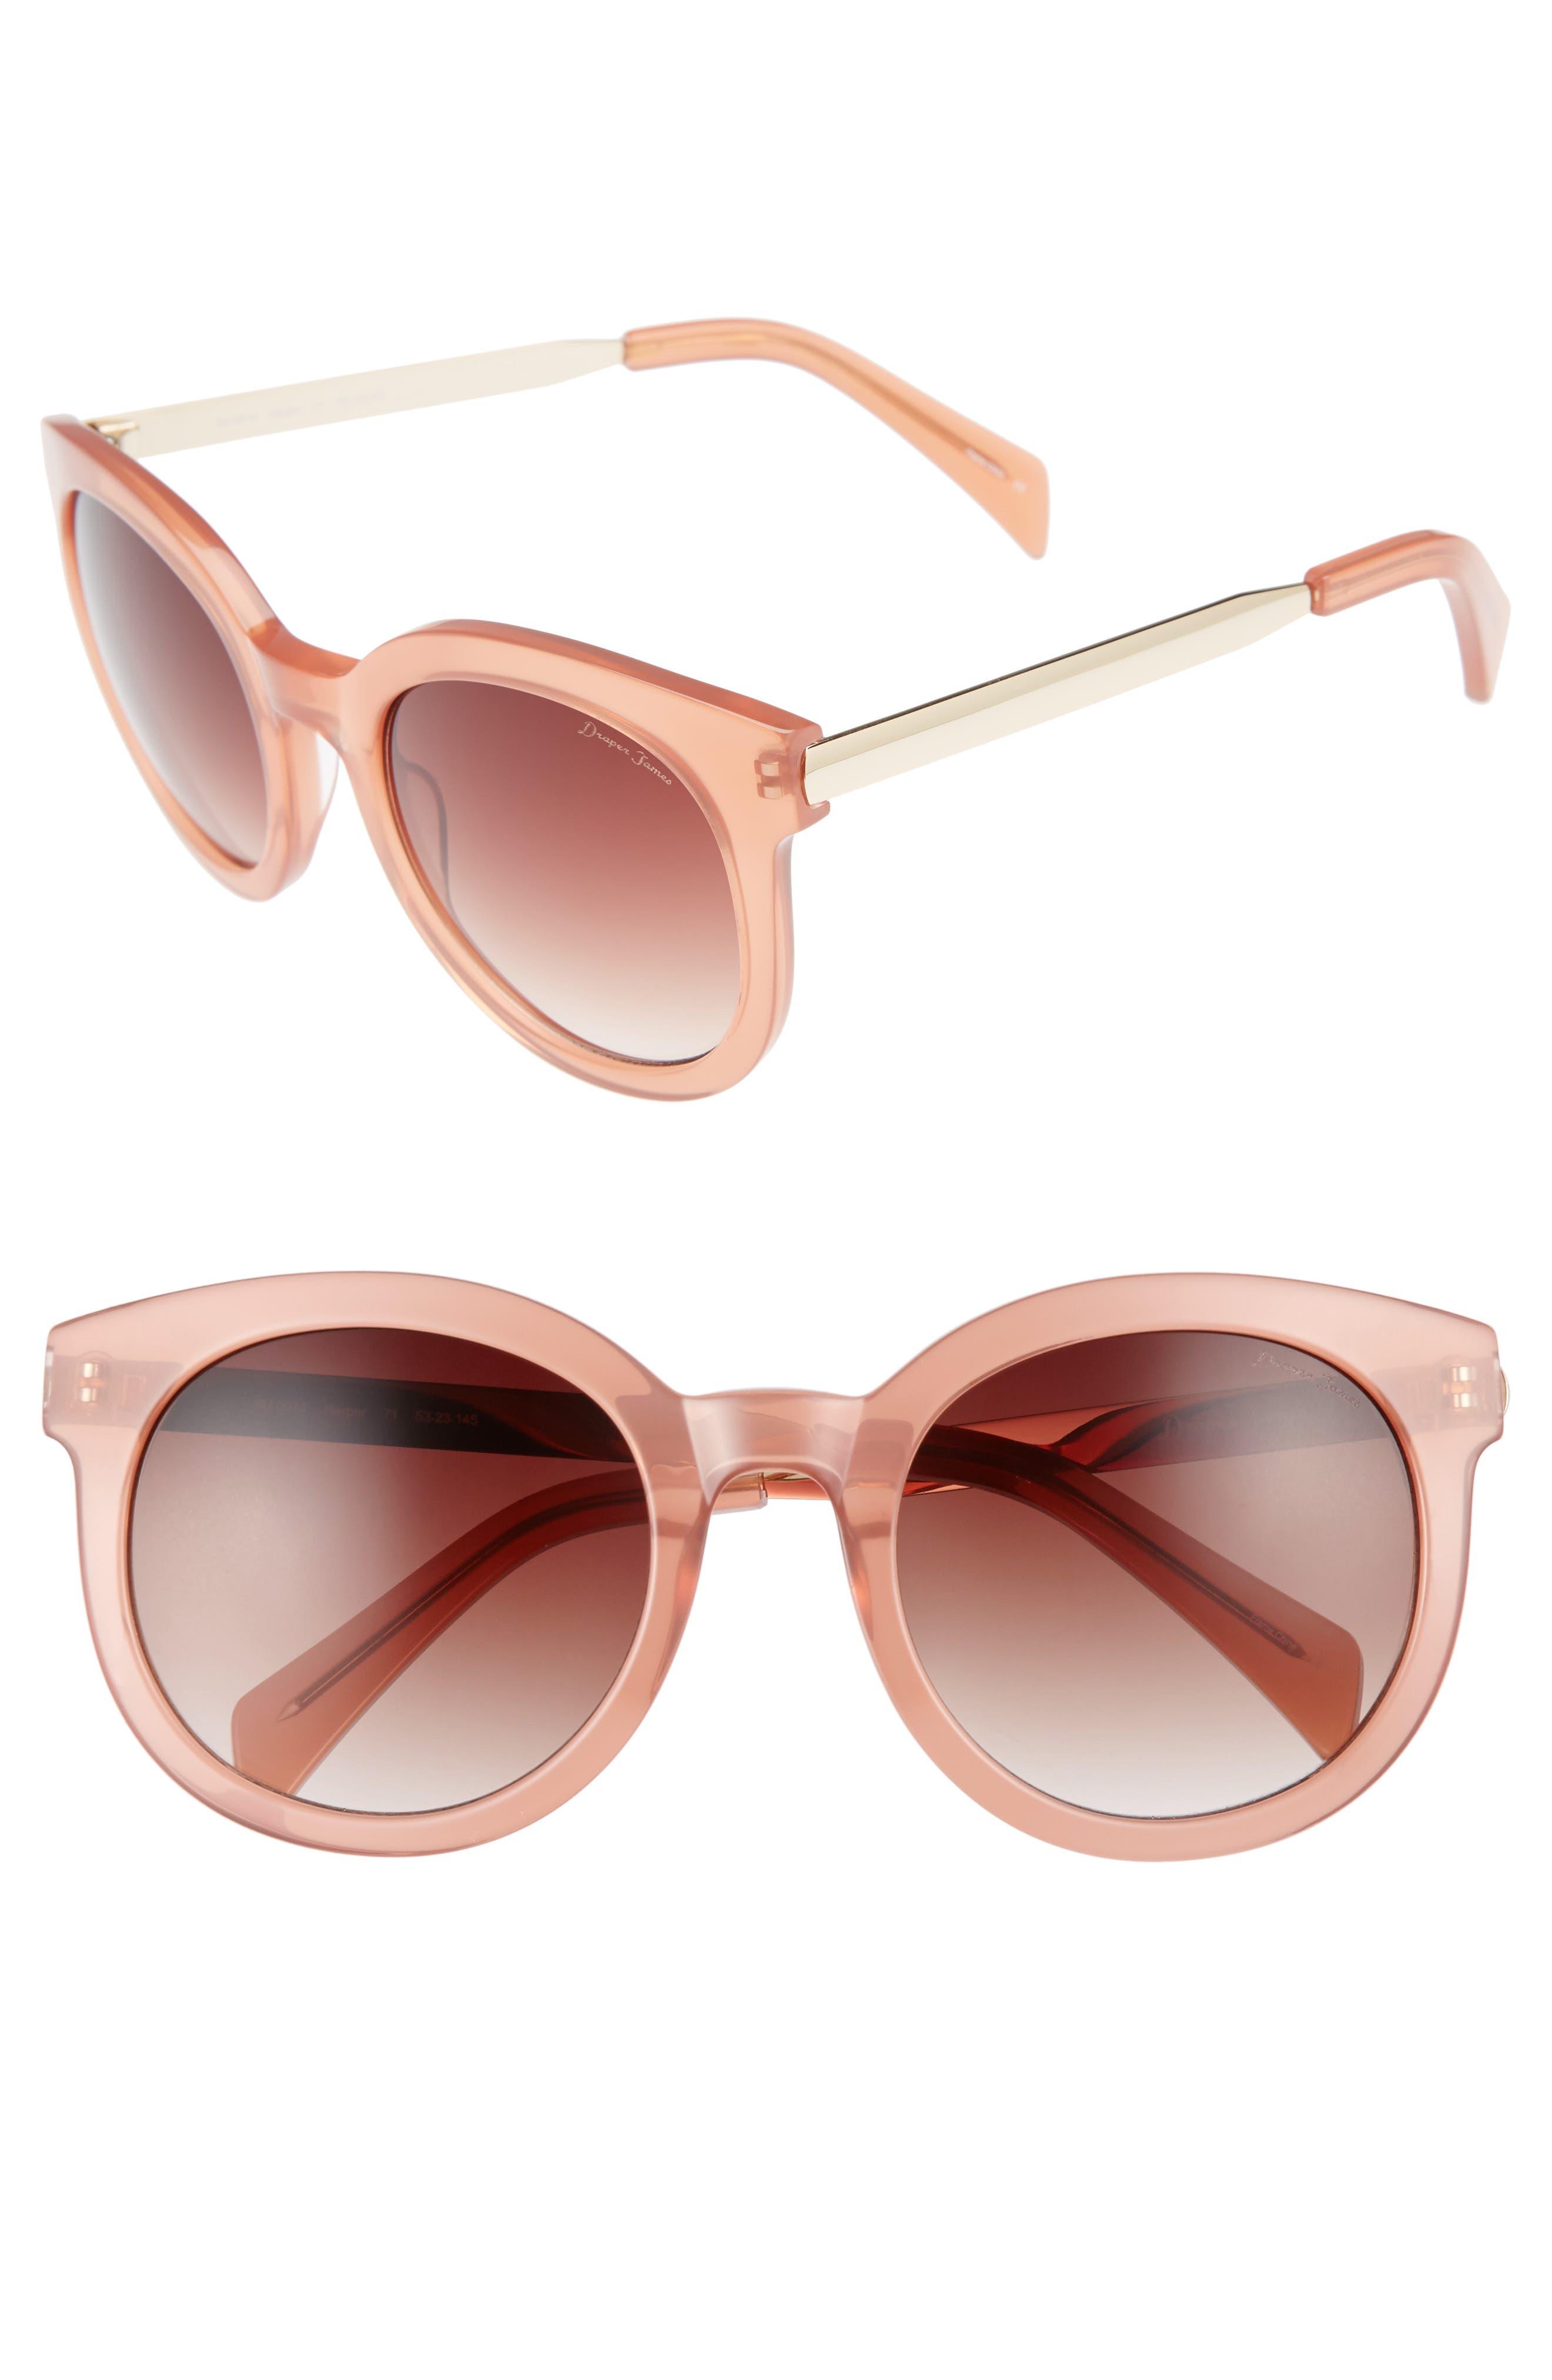 53mm Gradient Lens Round Sunglasses,                         Main,                         color, Pink